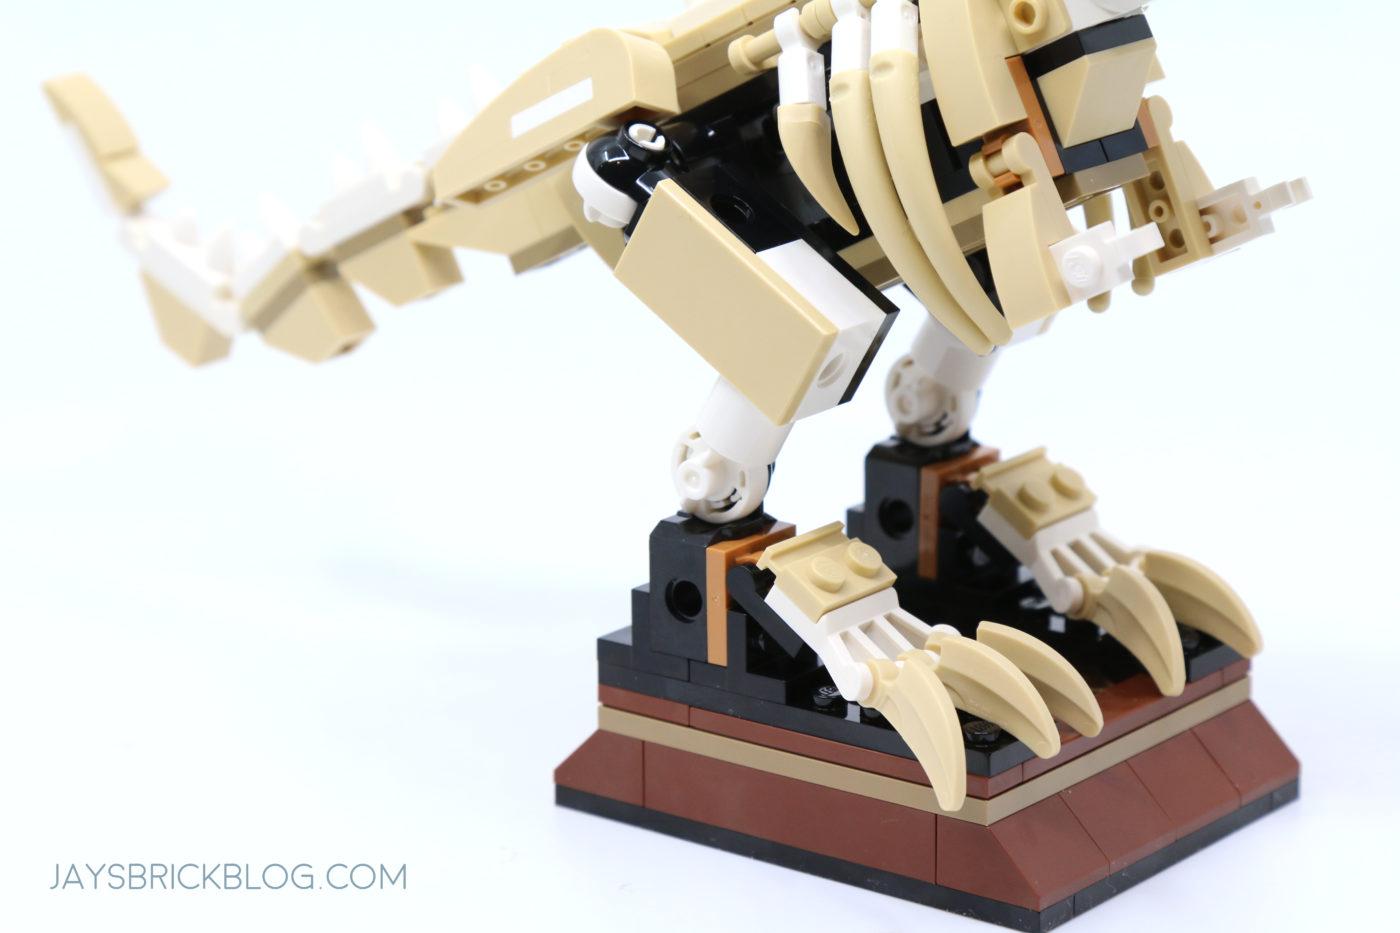 LEGO 76940 T. rex Dinosaur Fossil Exhibition T.Rex Legs